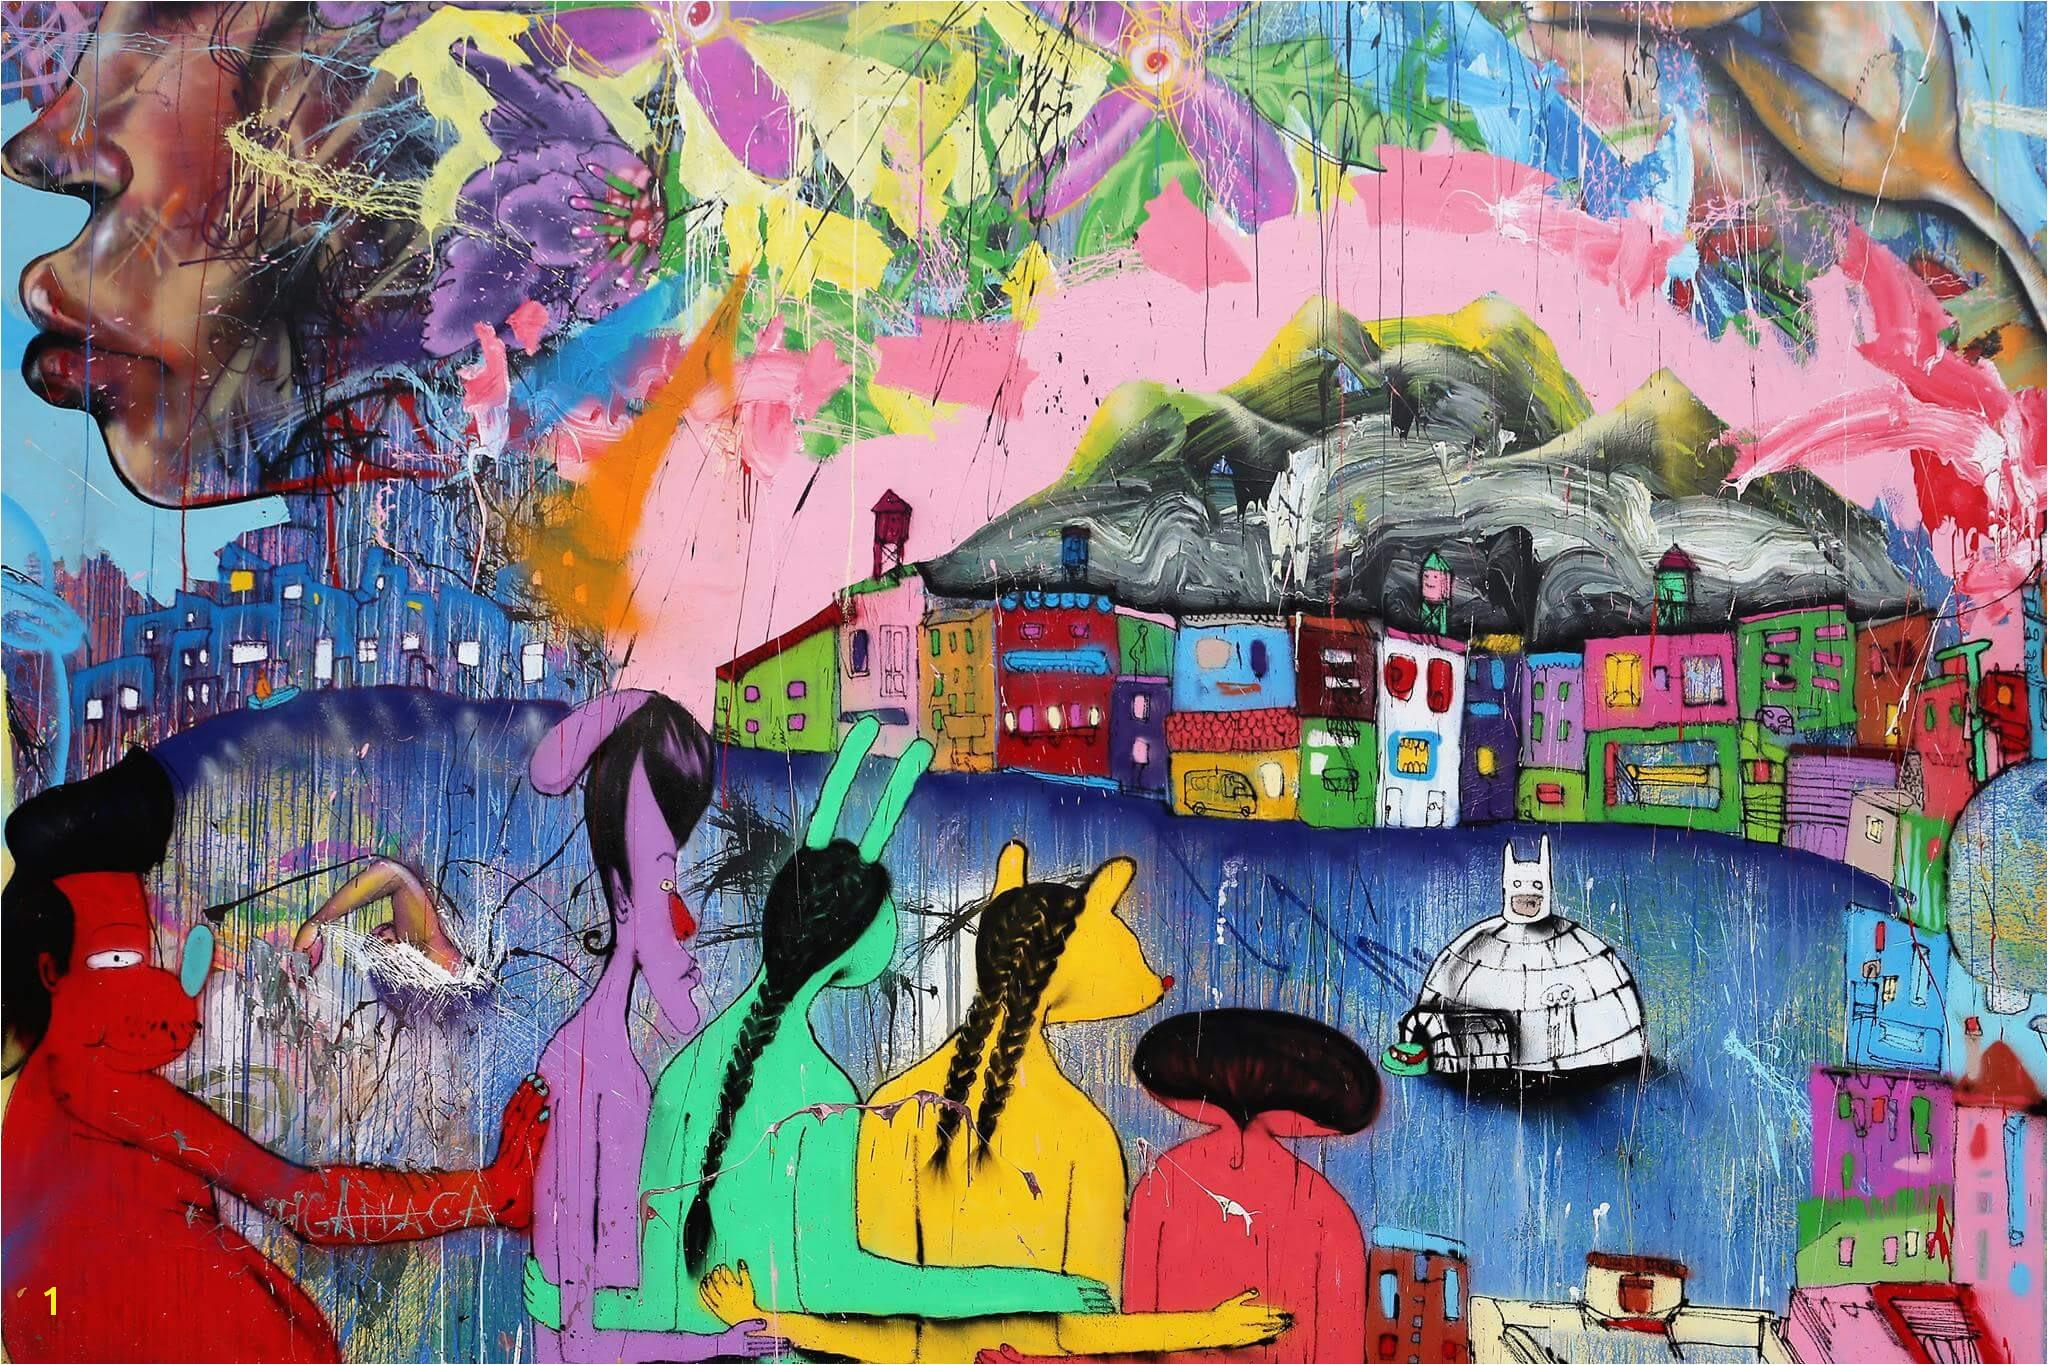 David Choe Houston Bowery Street Art Wall New York 2017 credit just a spectator